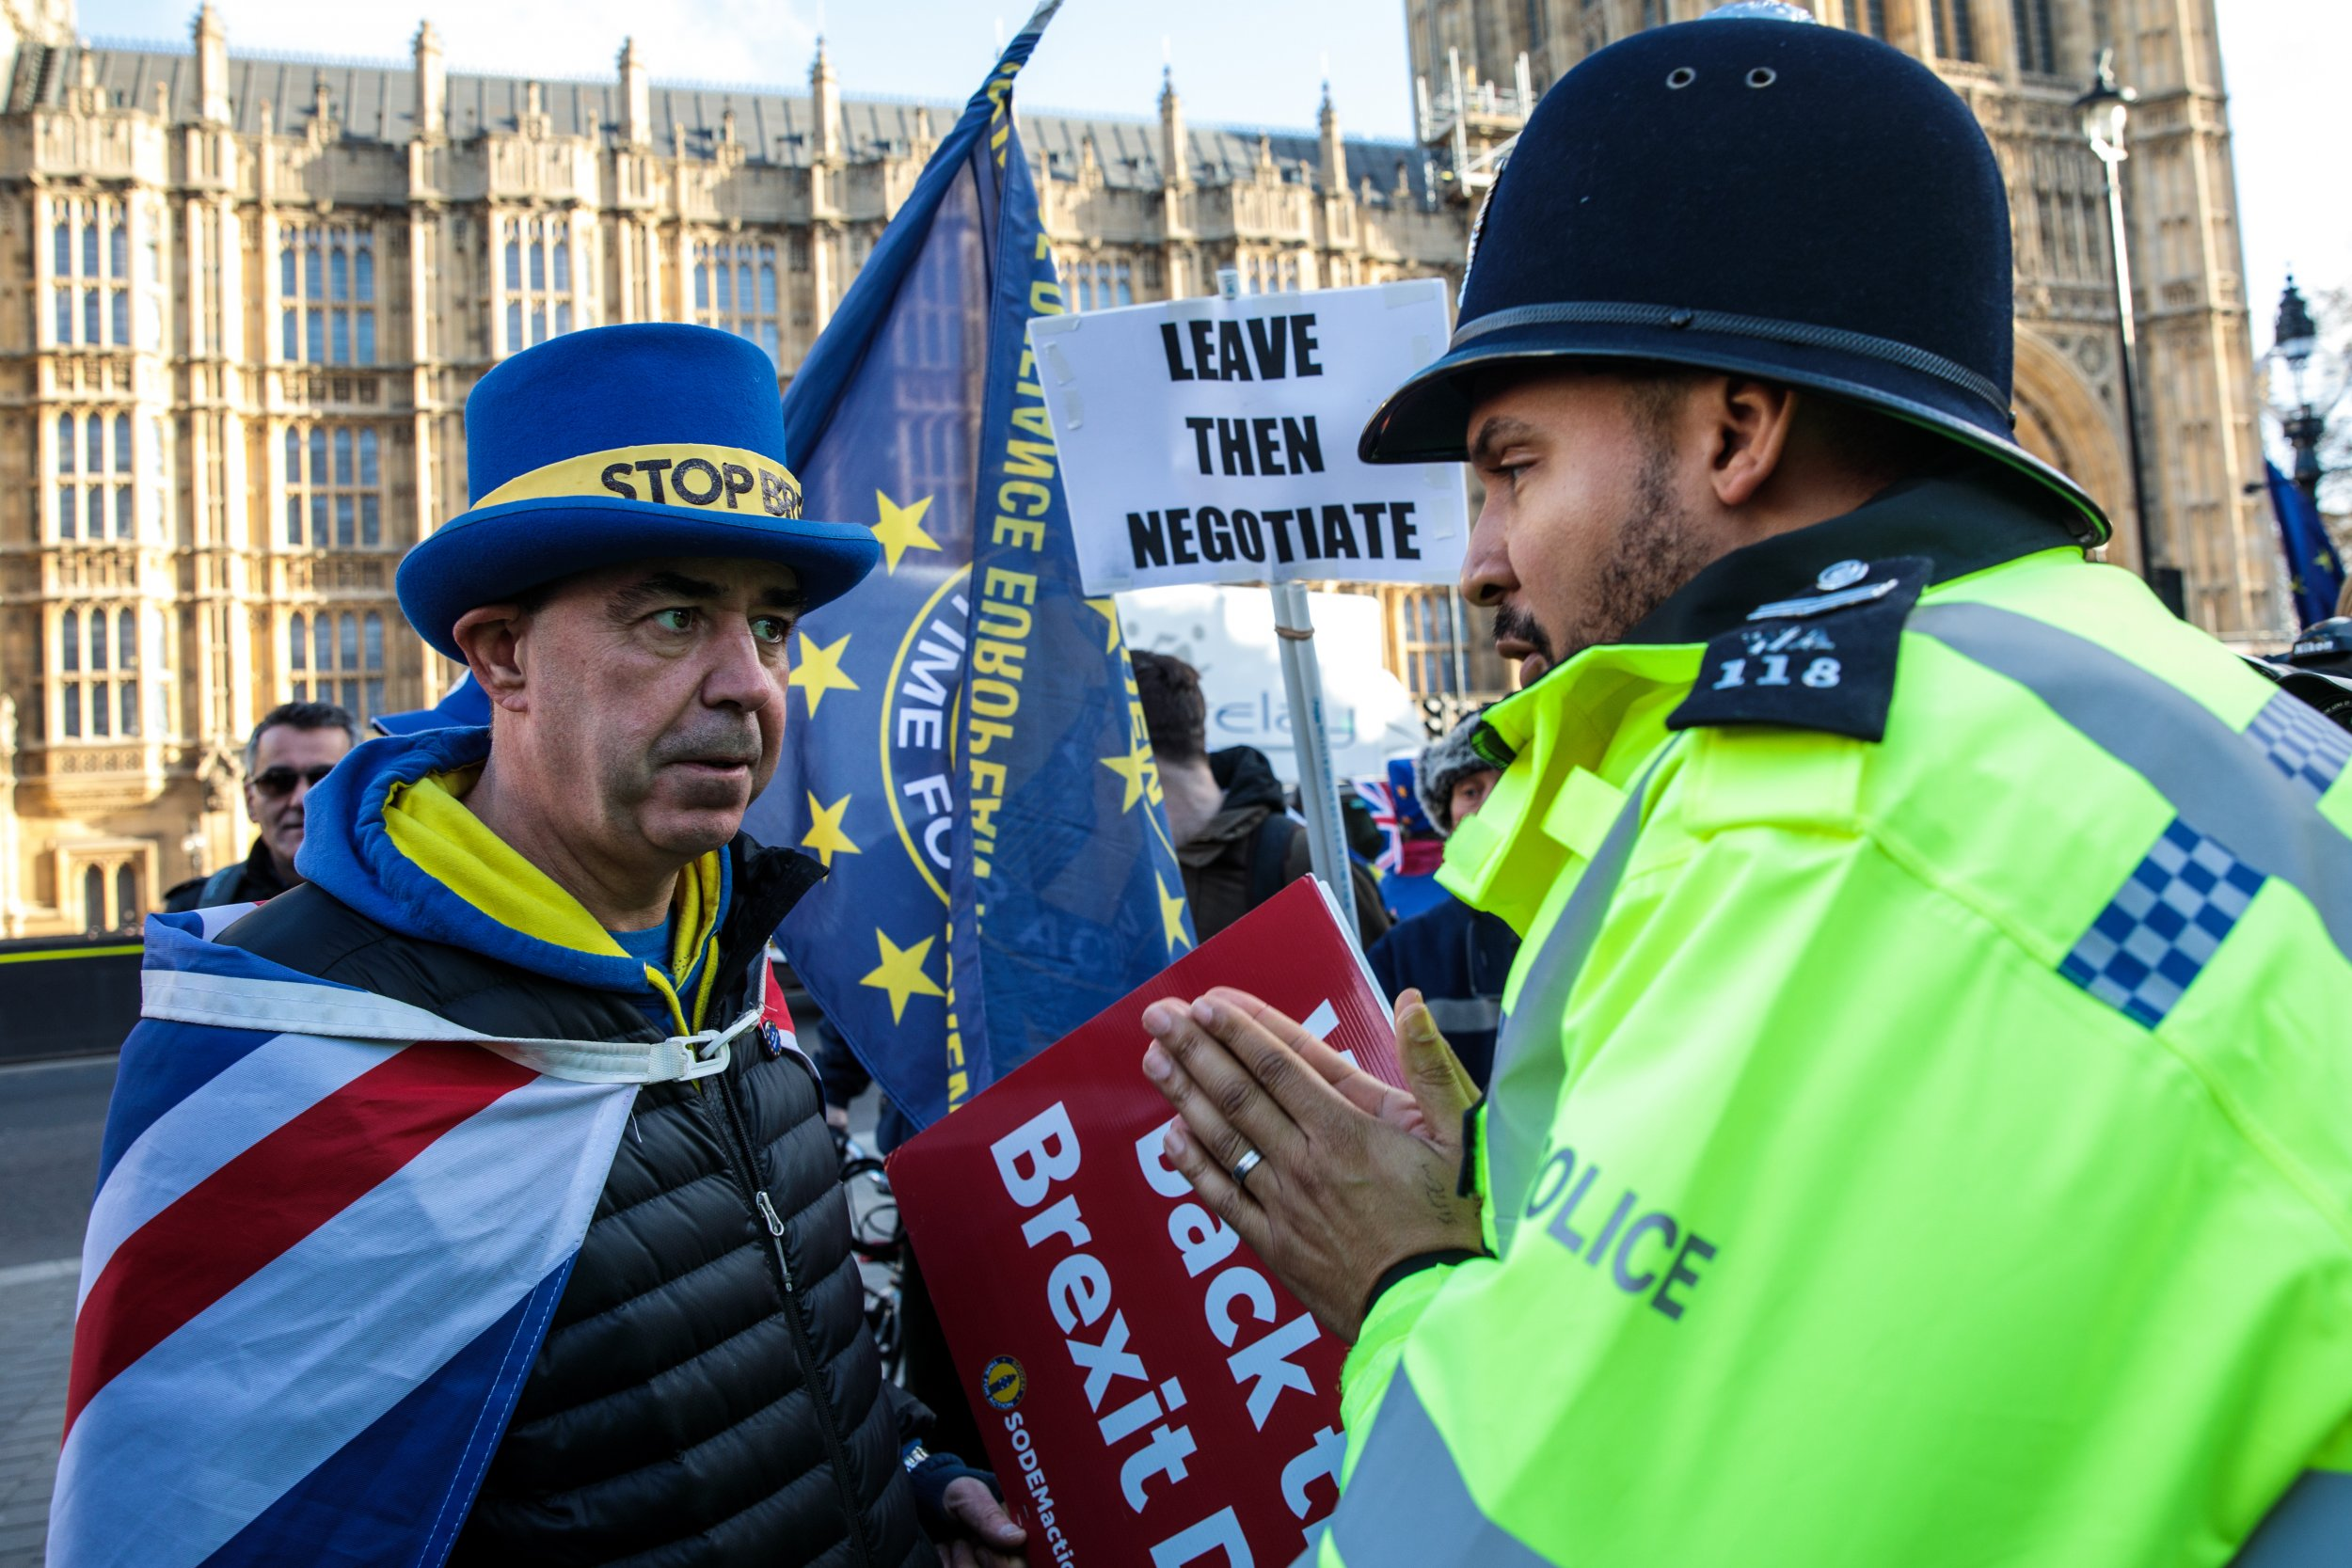 British police Brexit